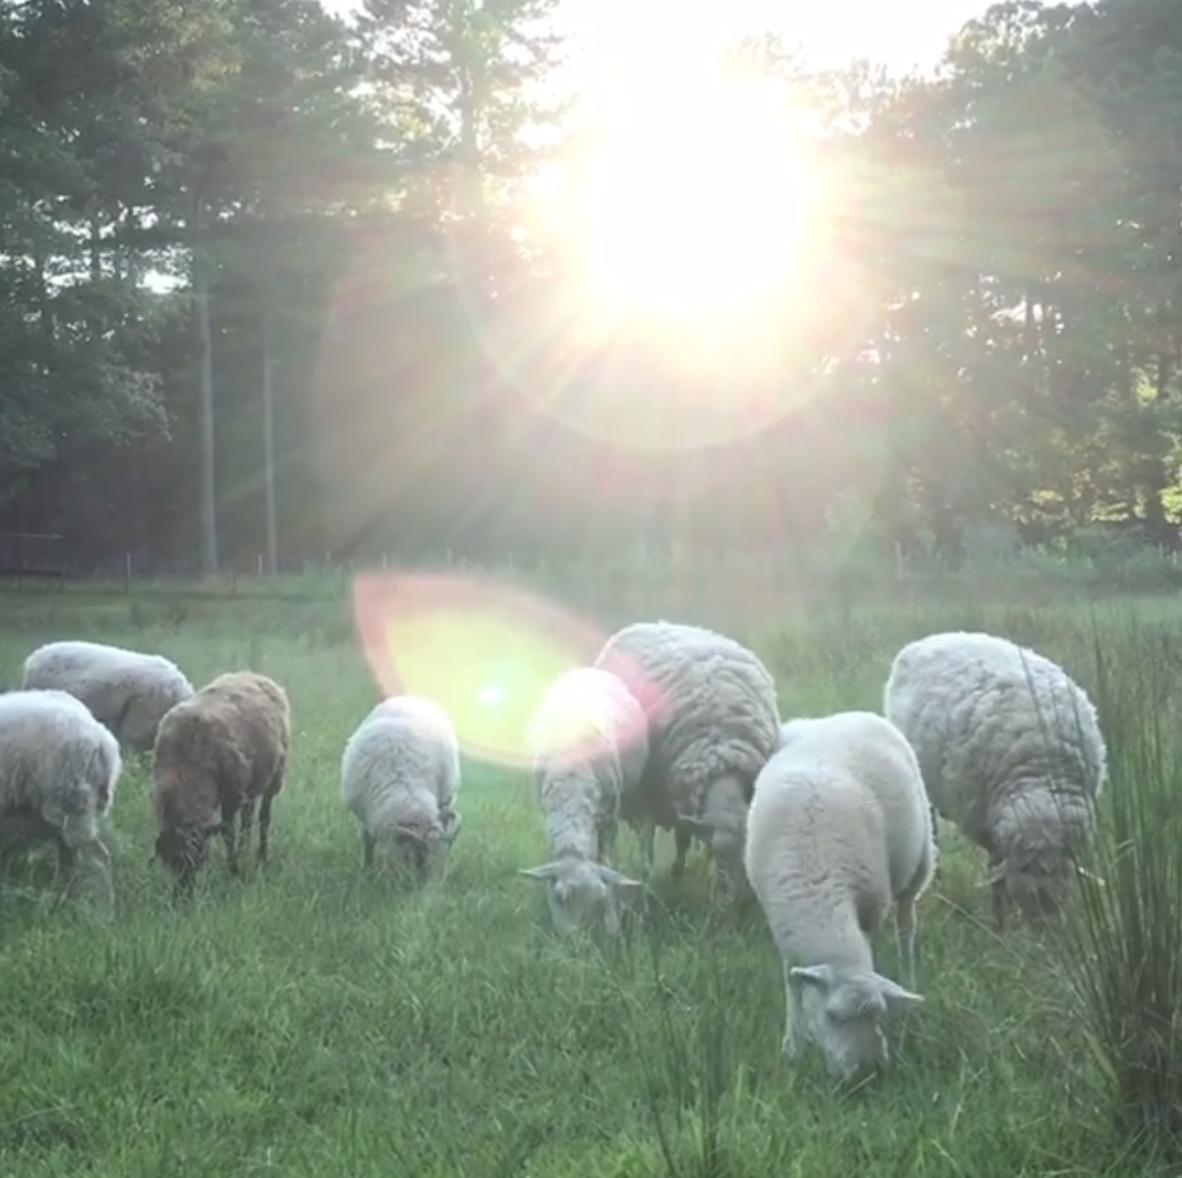 Image Via:  Pippinarrow Cottage Farm